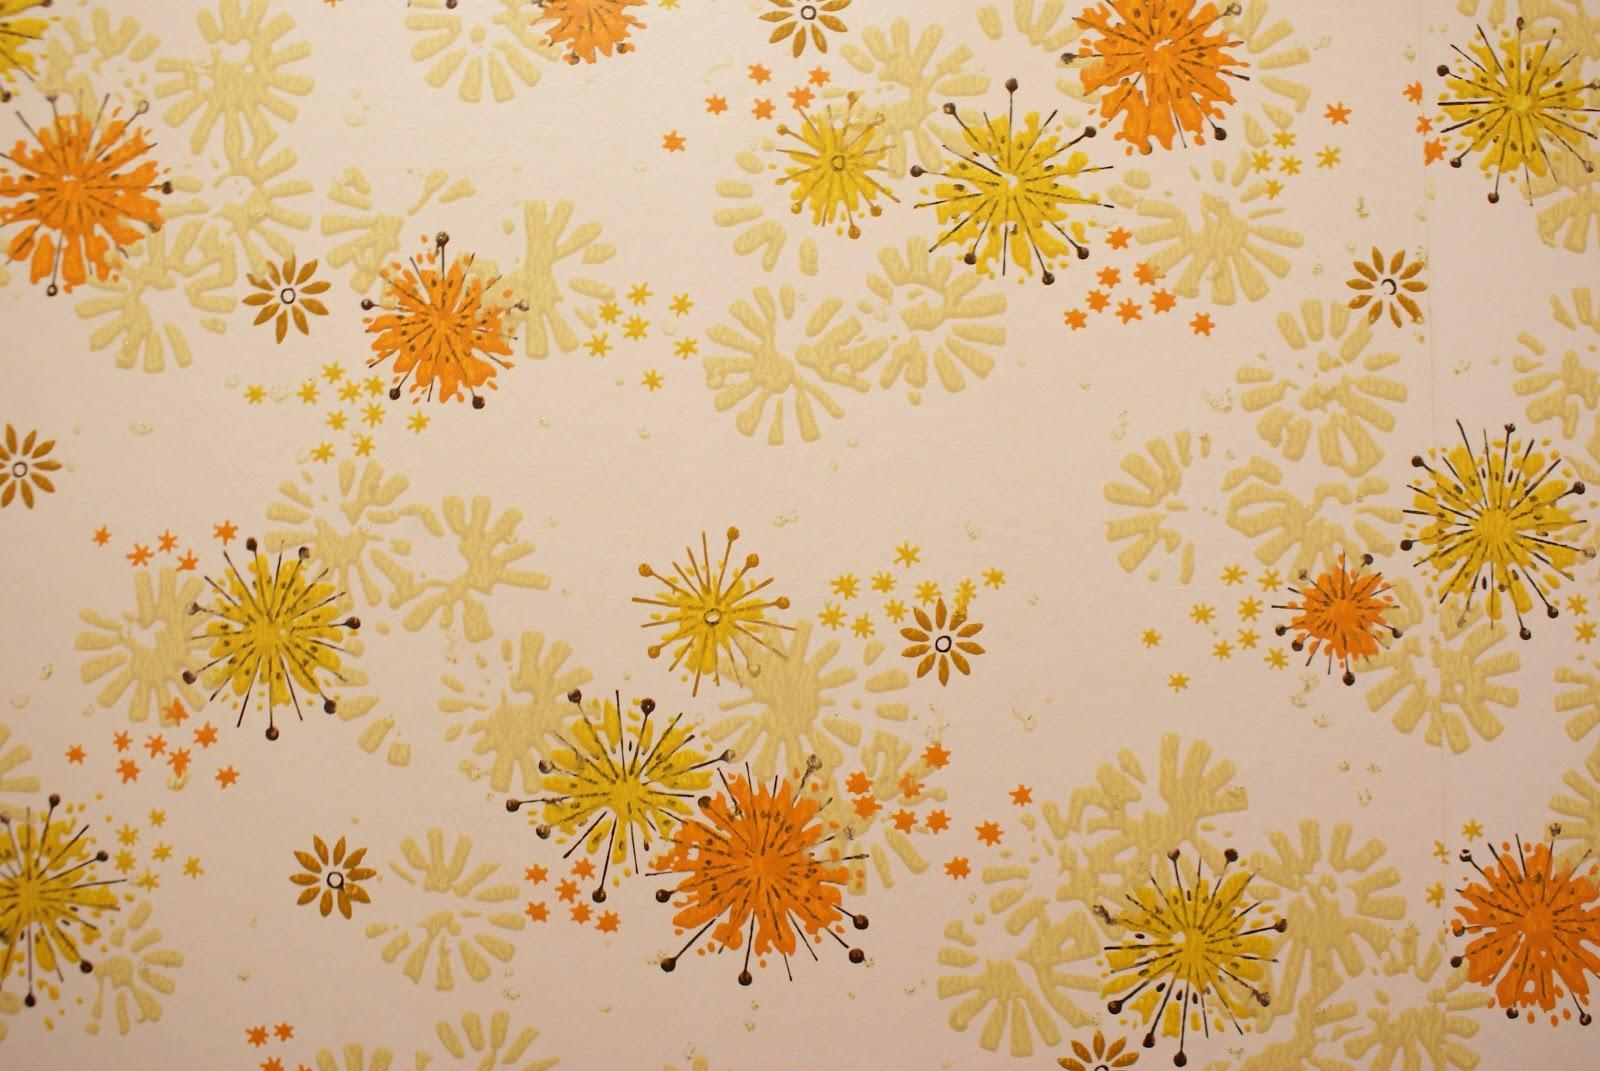 wallpaper pattern vintage - photo #18